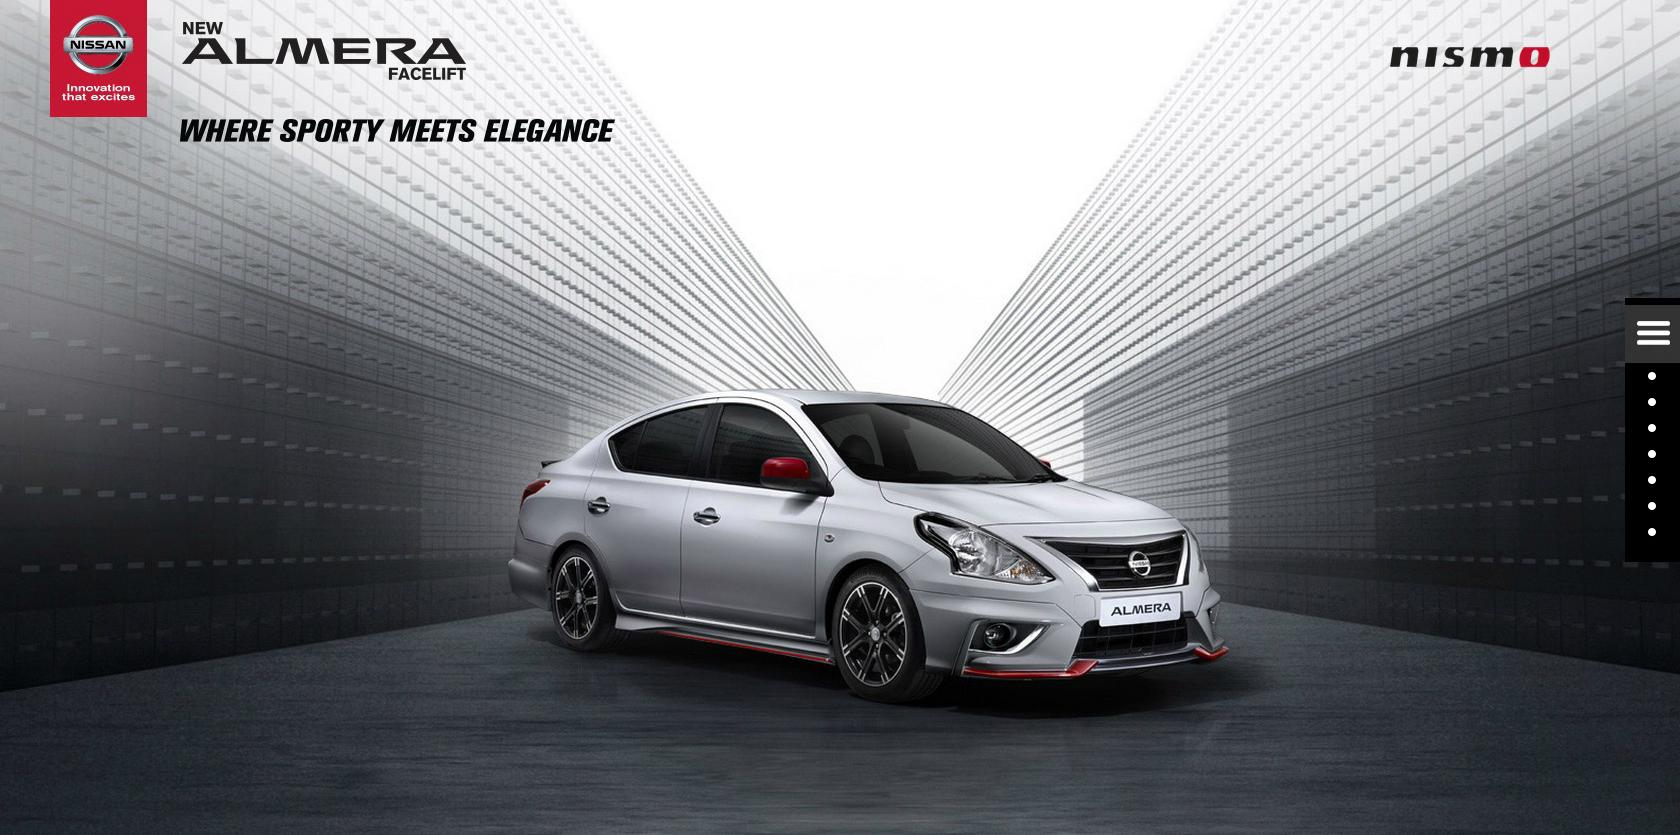 7 photos. Nissan Almera ...